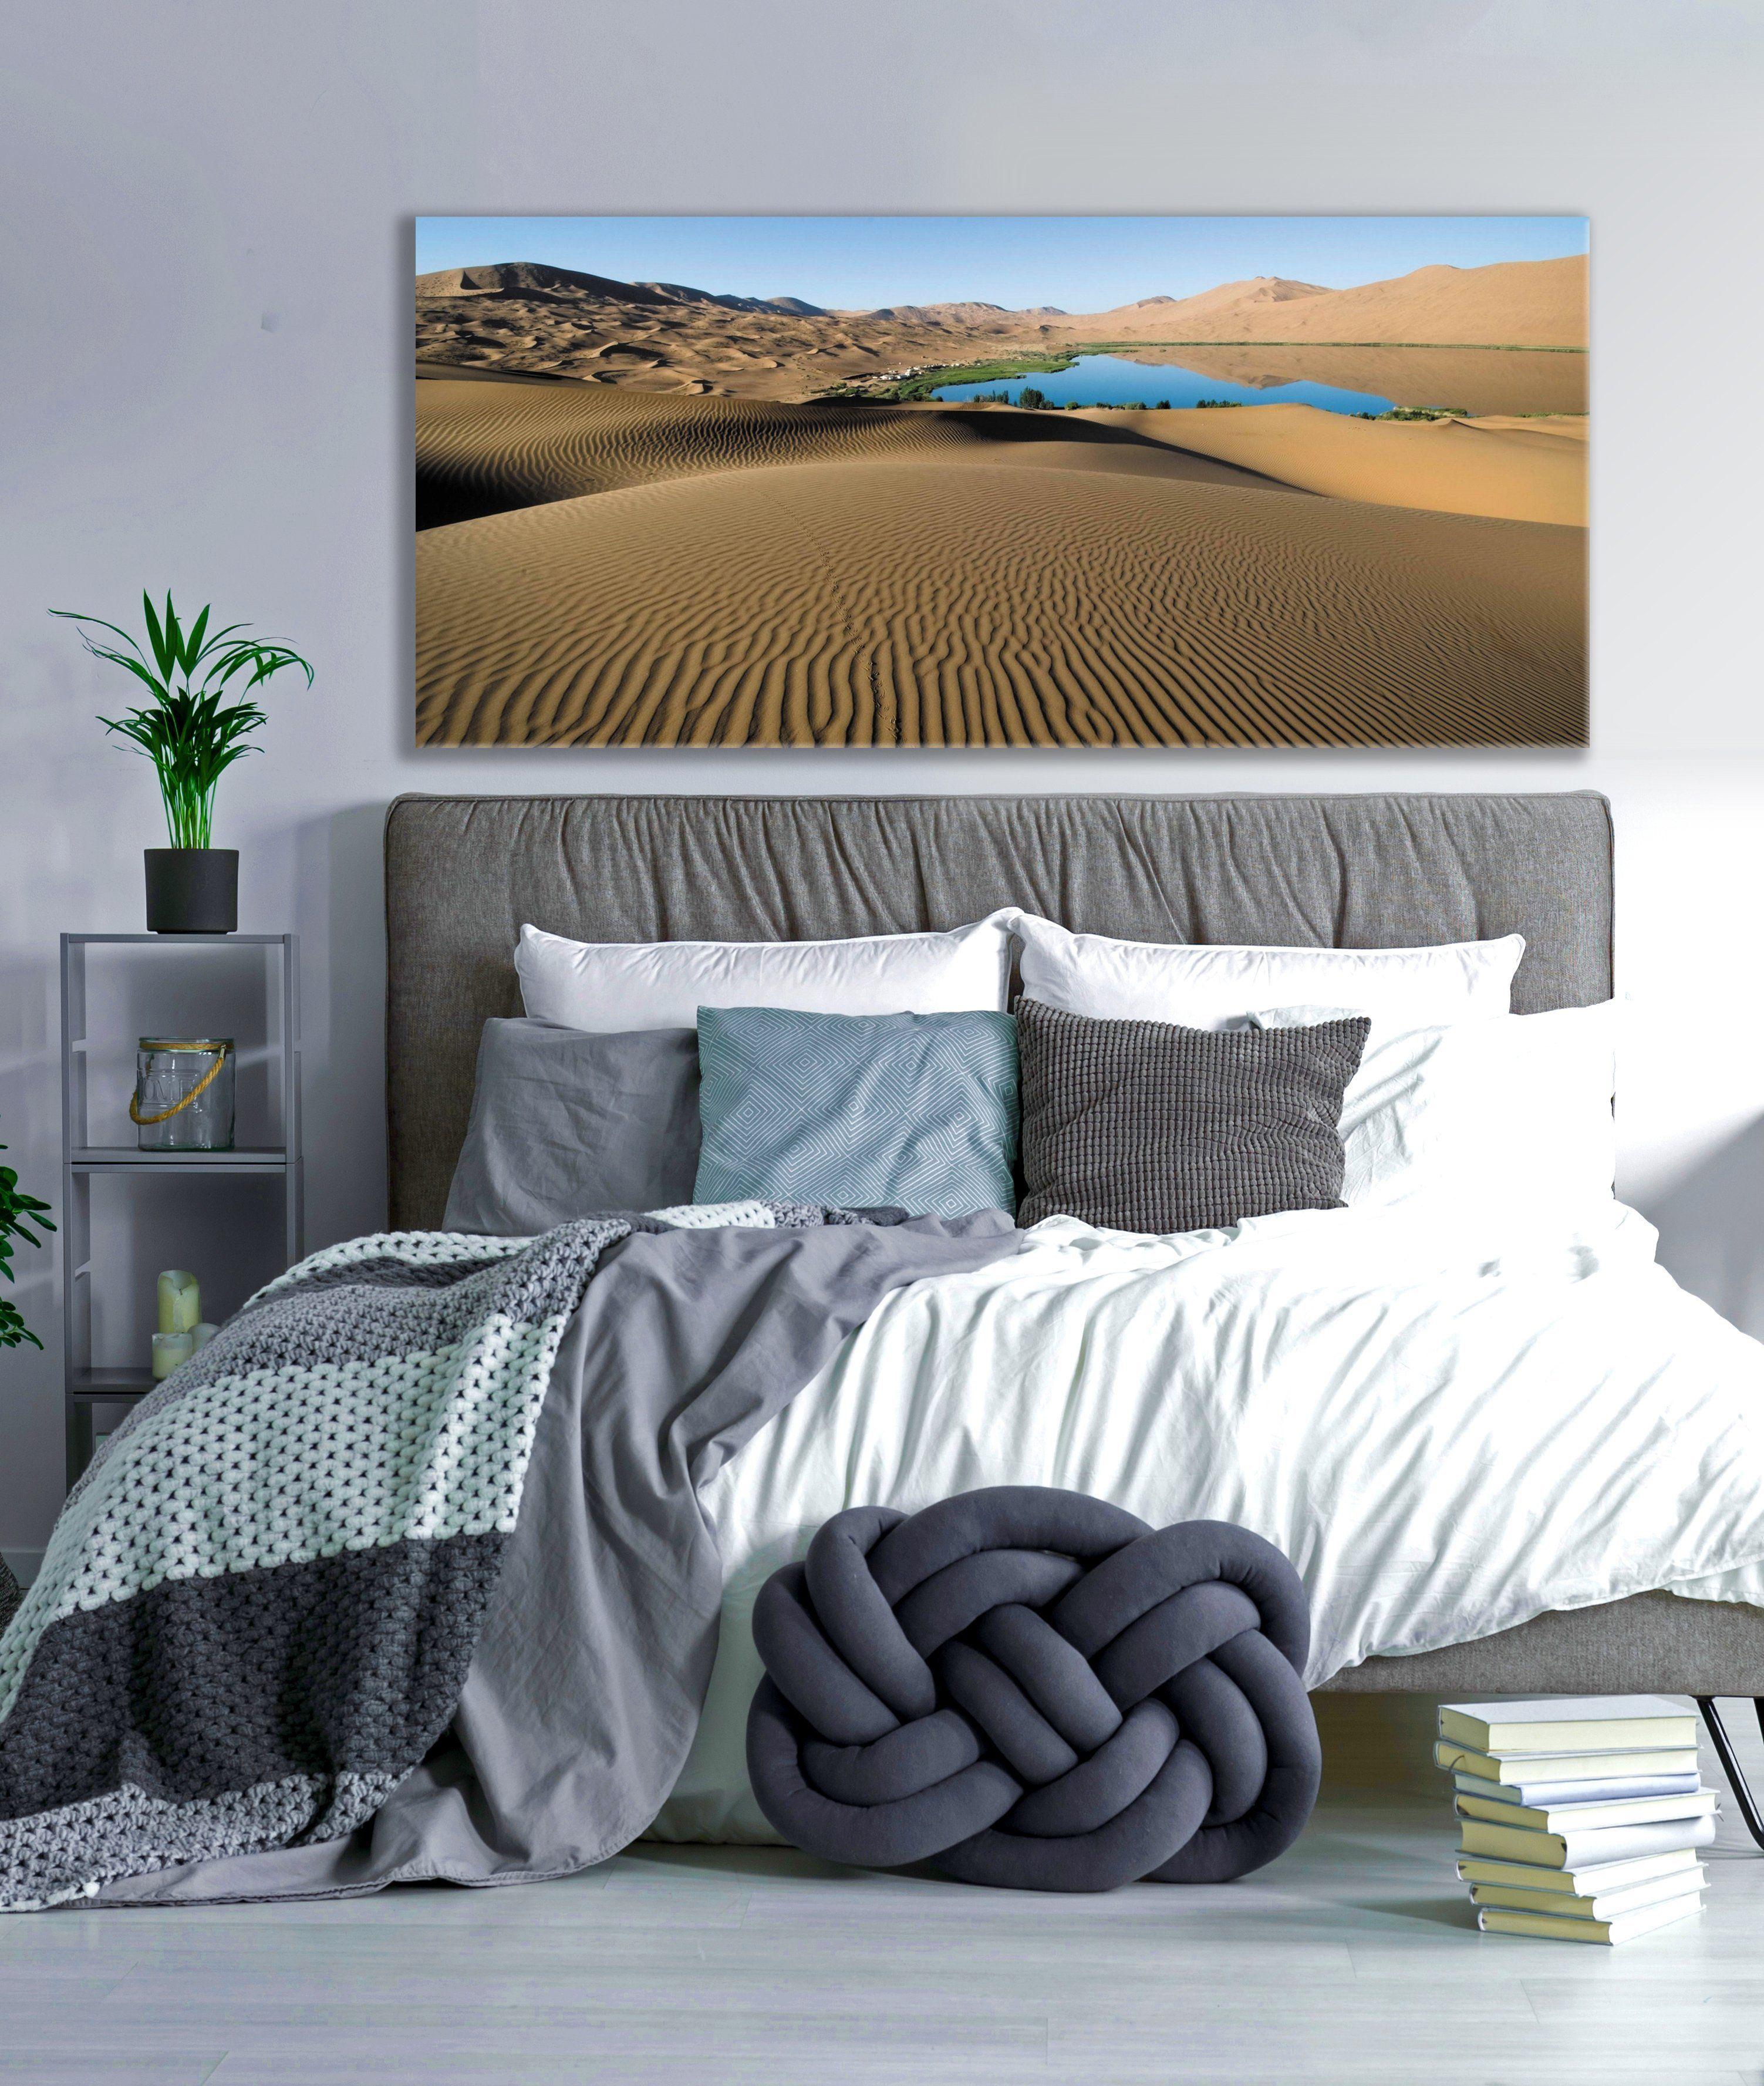 Landscape decor wall art desert wood frame ready to hang